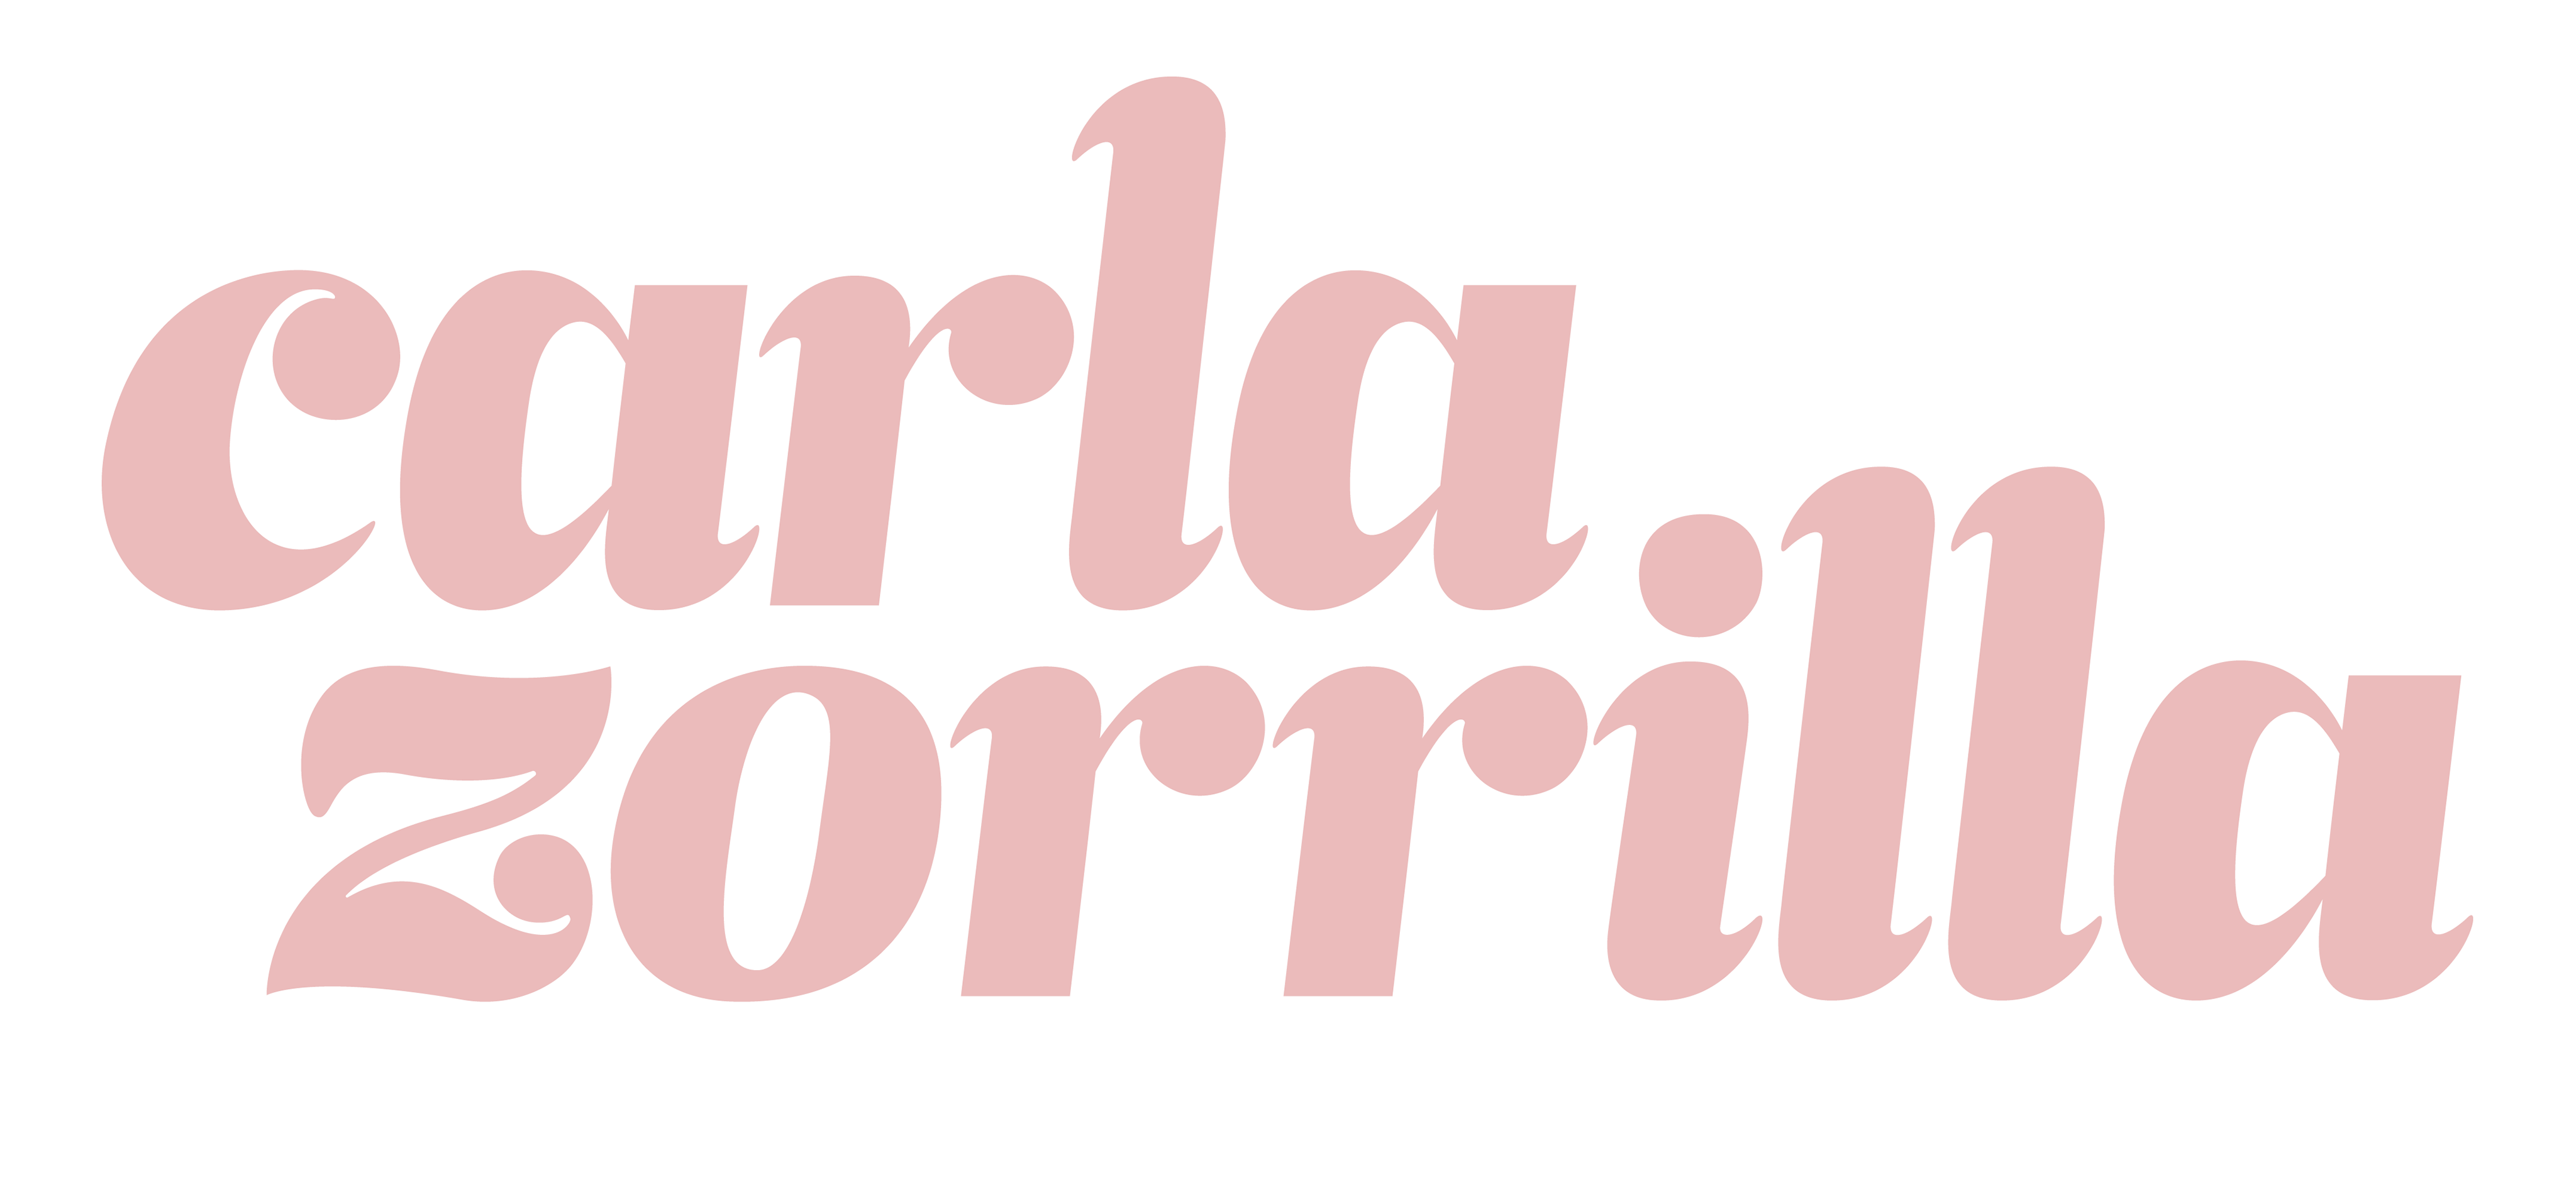 Carla Zorrilla